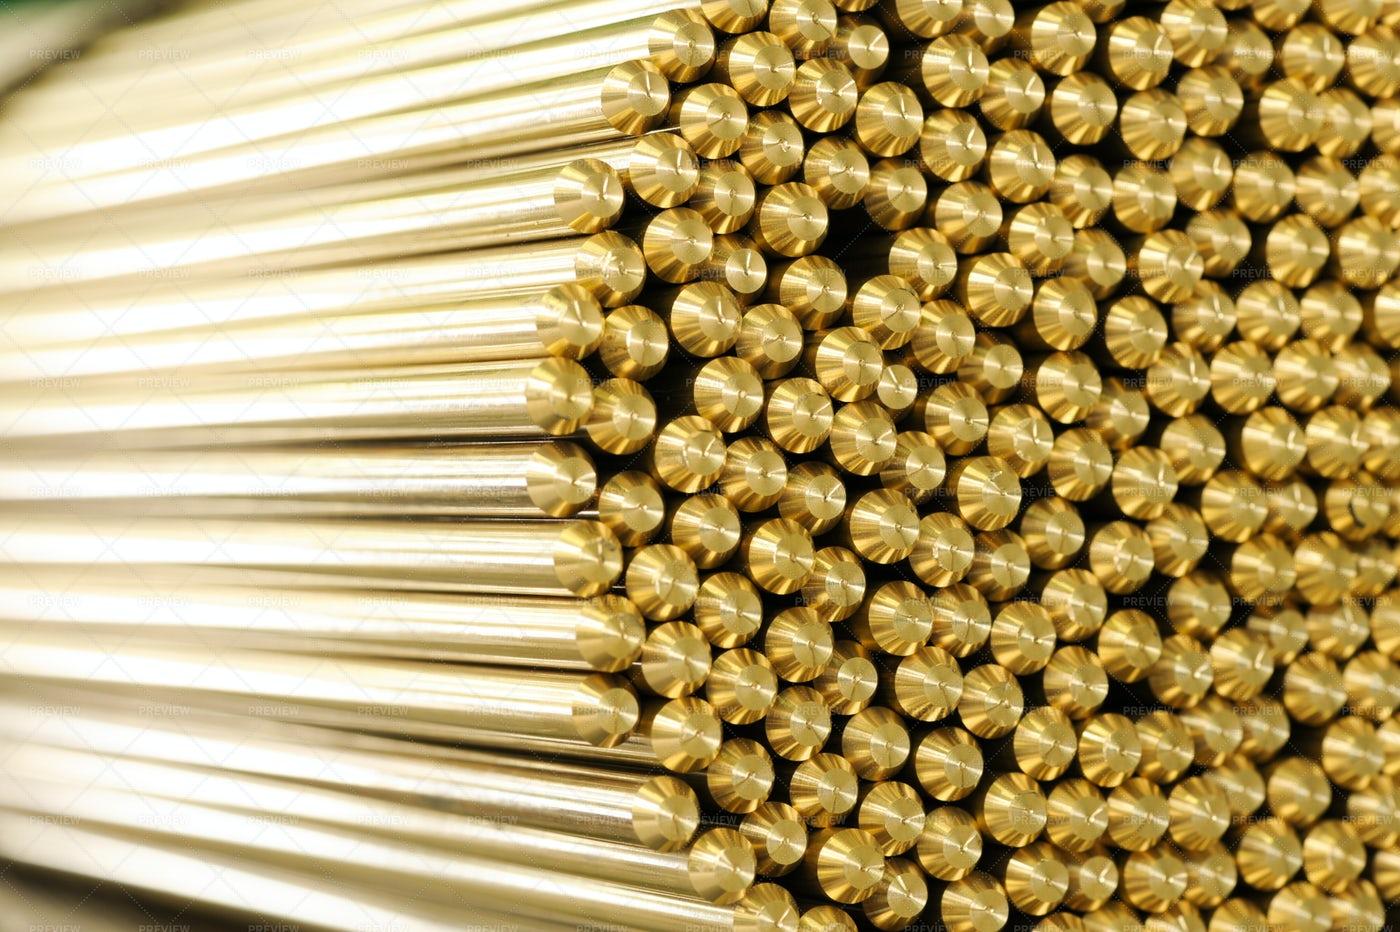 Brass Rods: Stock Photos